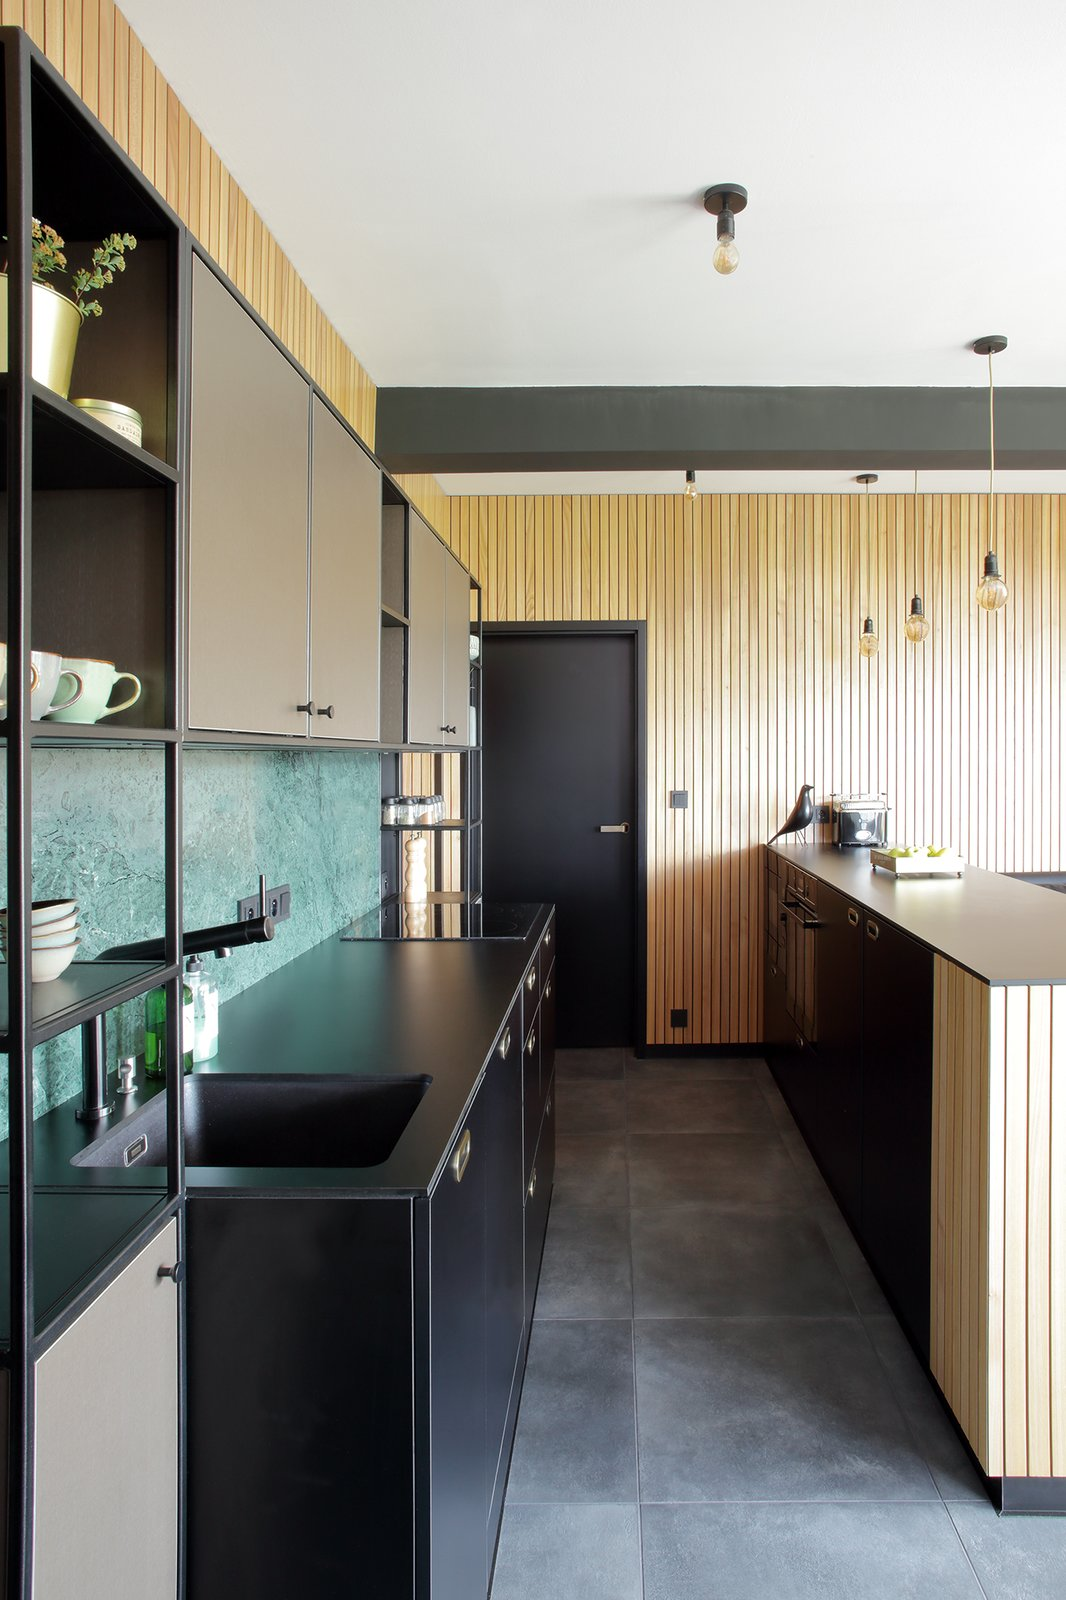 Kitchen, Laminate, Ceramic Tile, Pendant, Wood, Marble, and Laminate custom made kitchen  Best Kitchen Laminate Laminate Photos from Mountain Apartment in Ore Mountain, Czech Republic